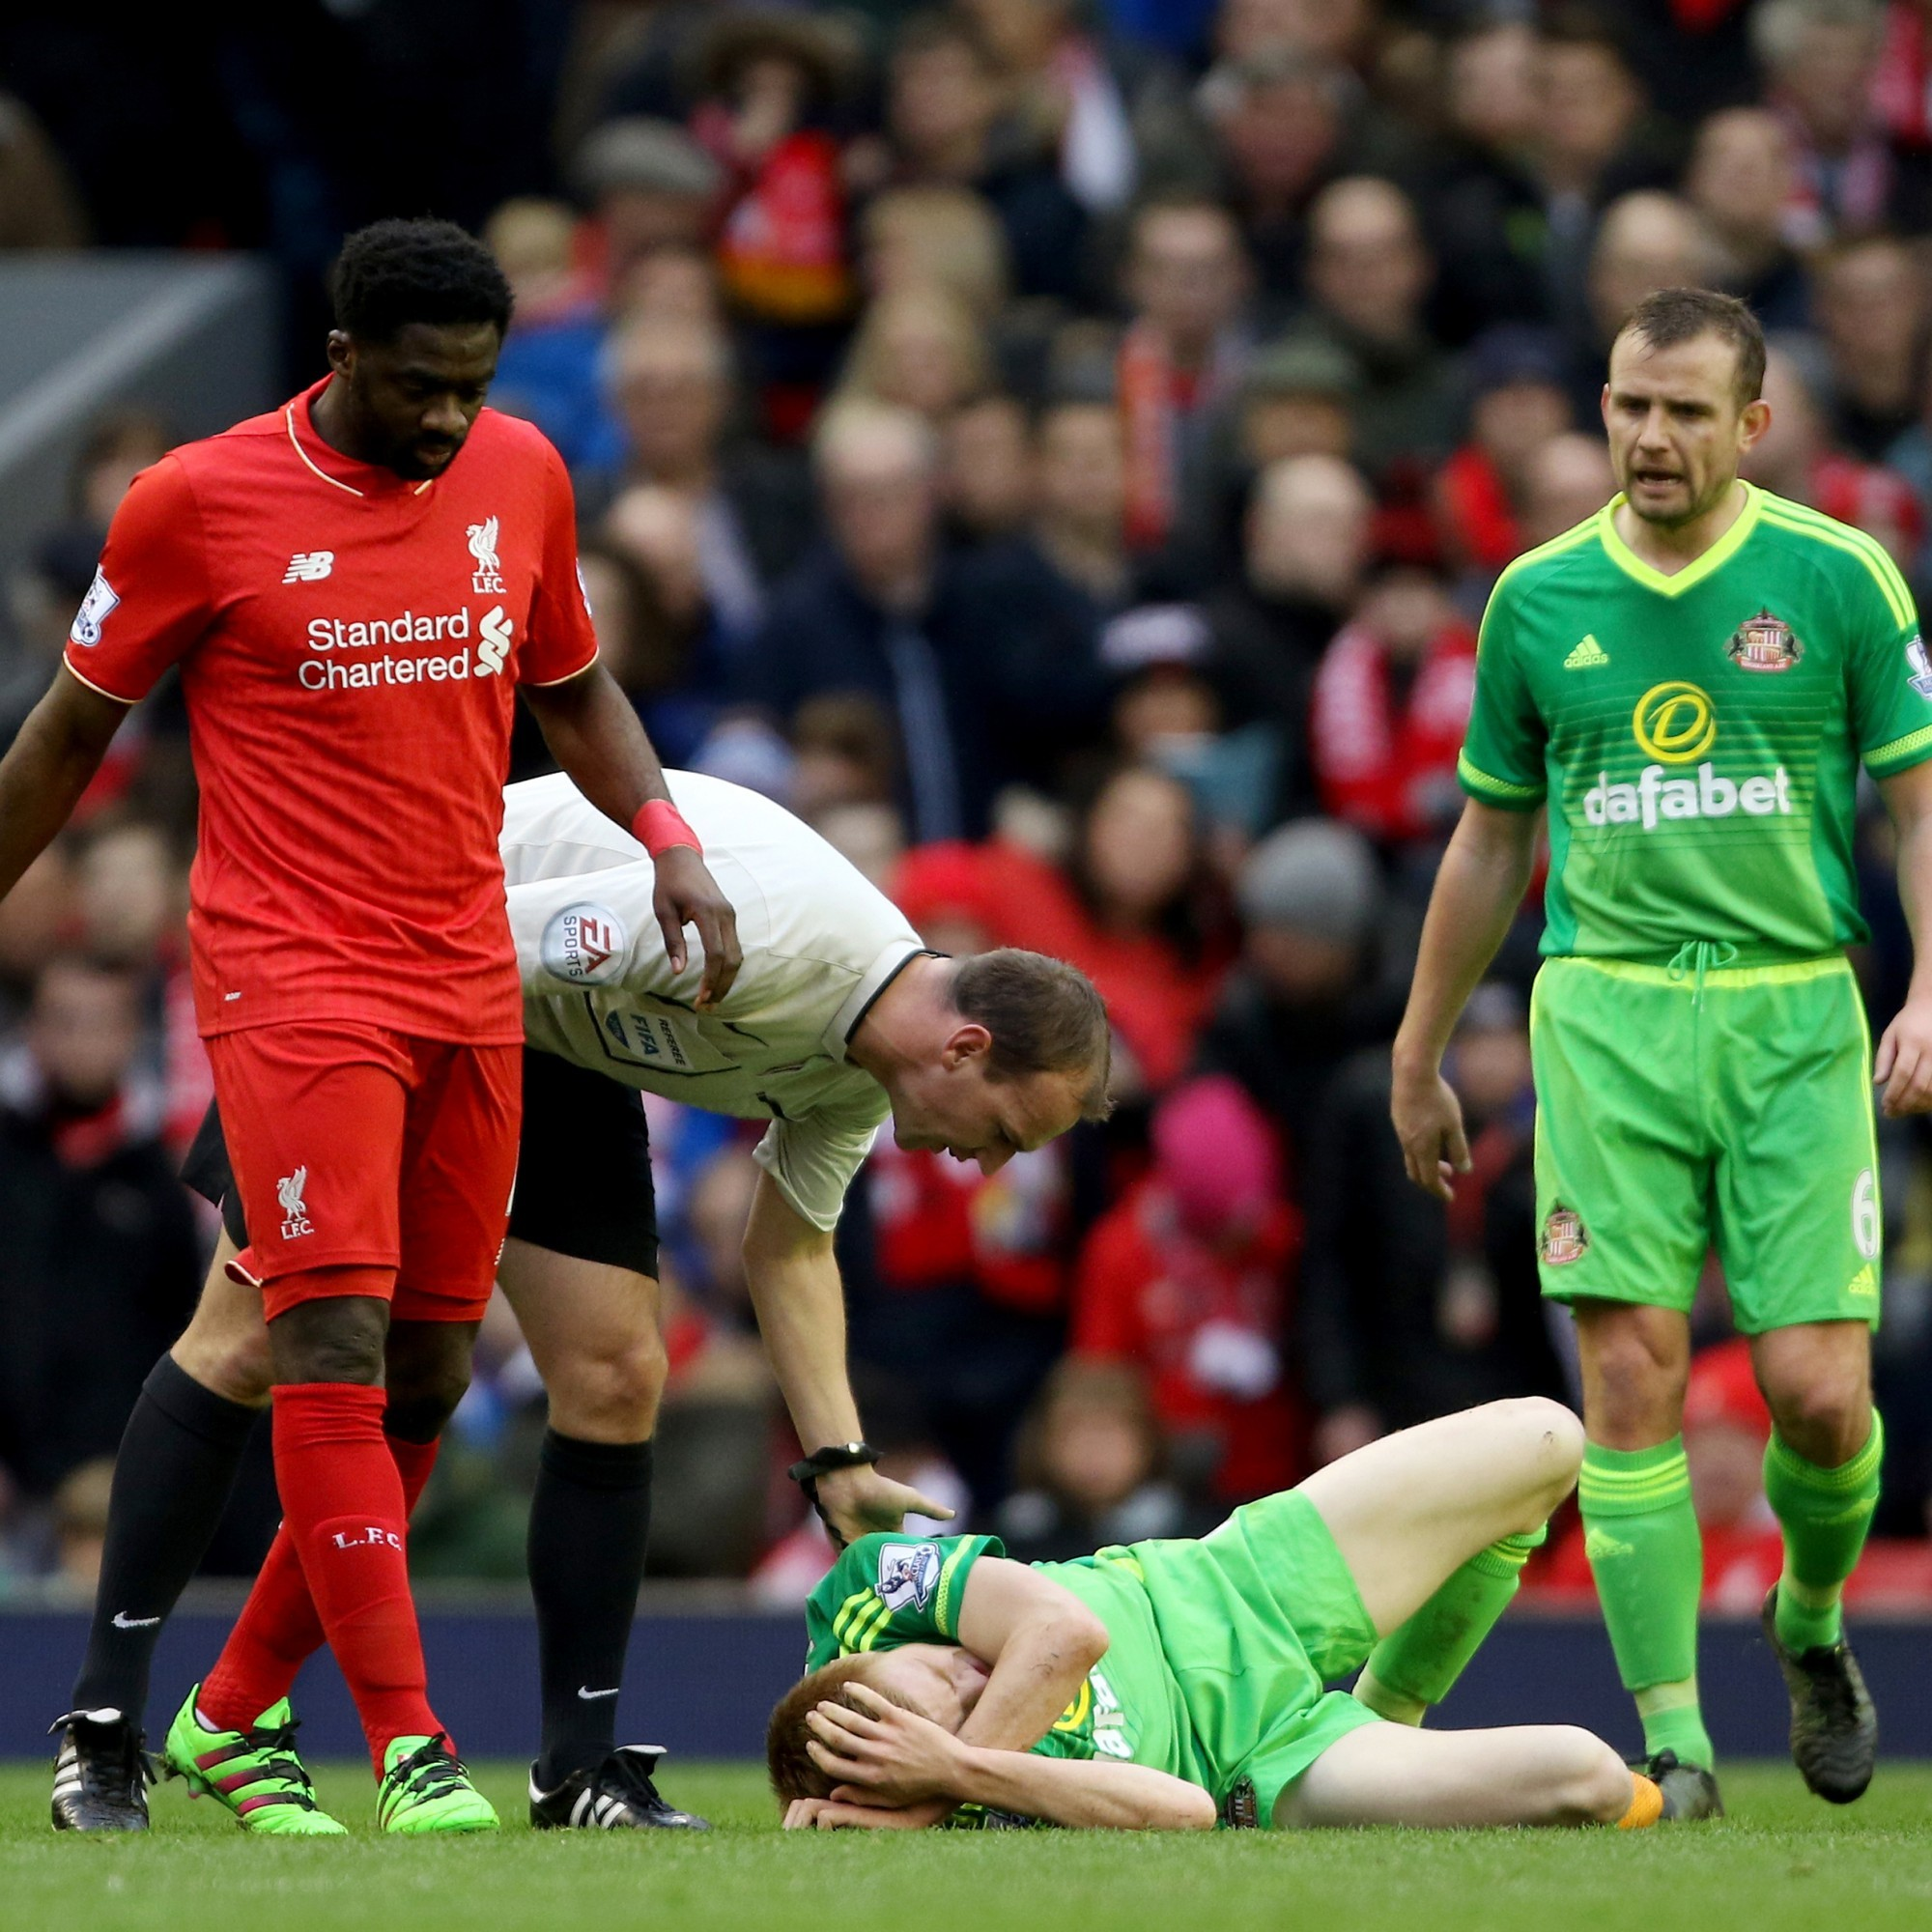 As it happened: Liverpool v Sunderland, Premier League